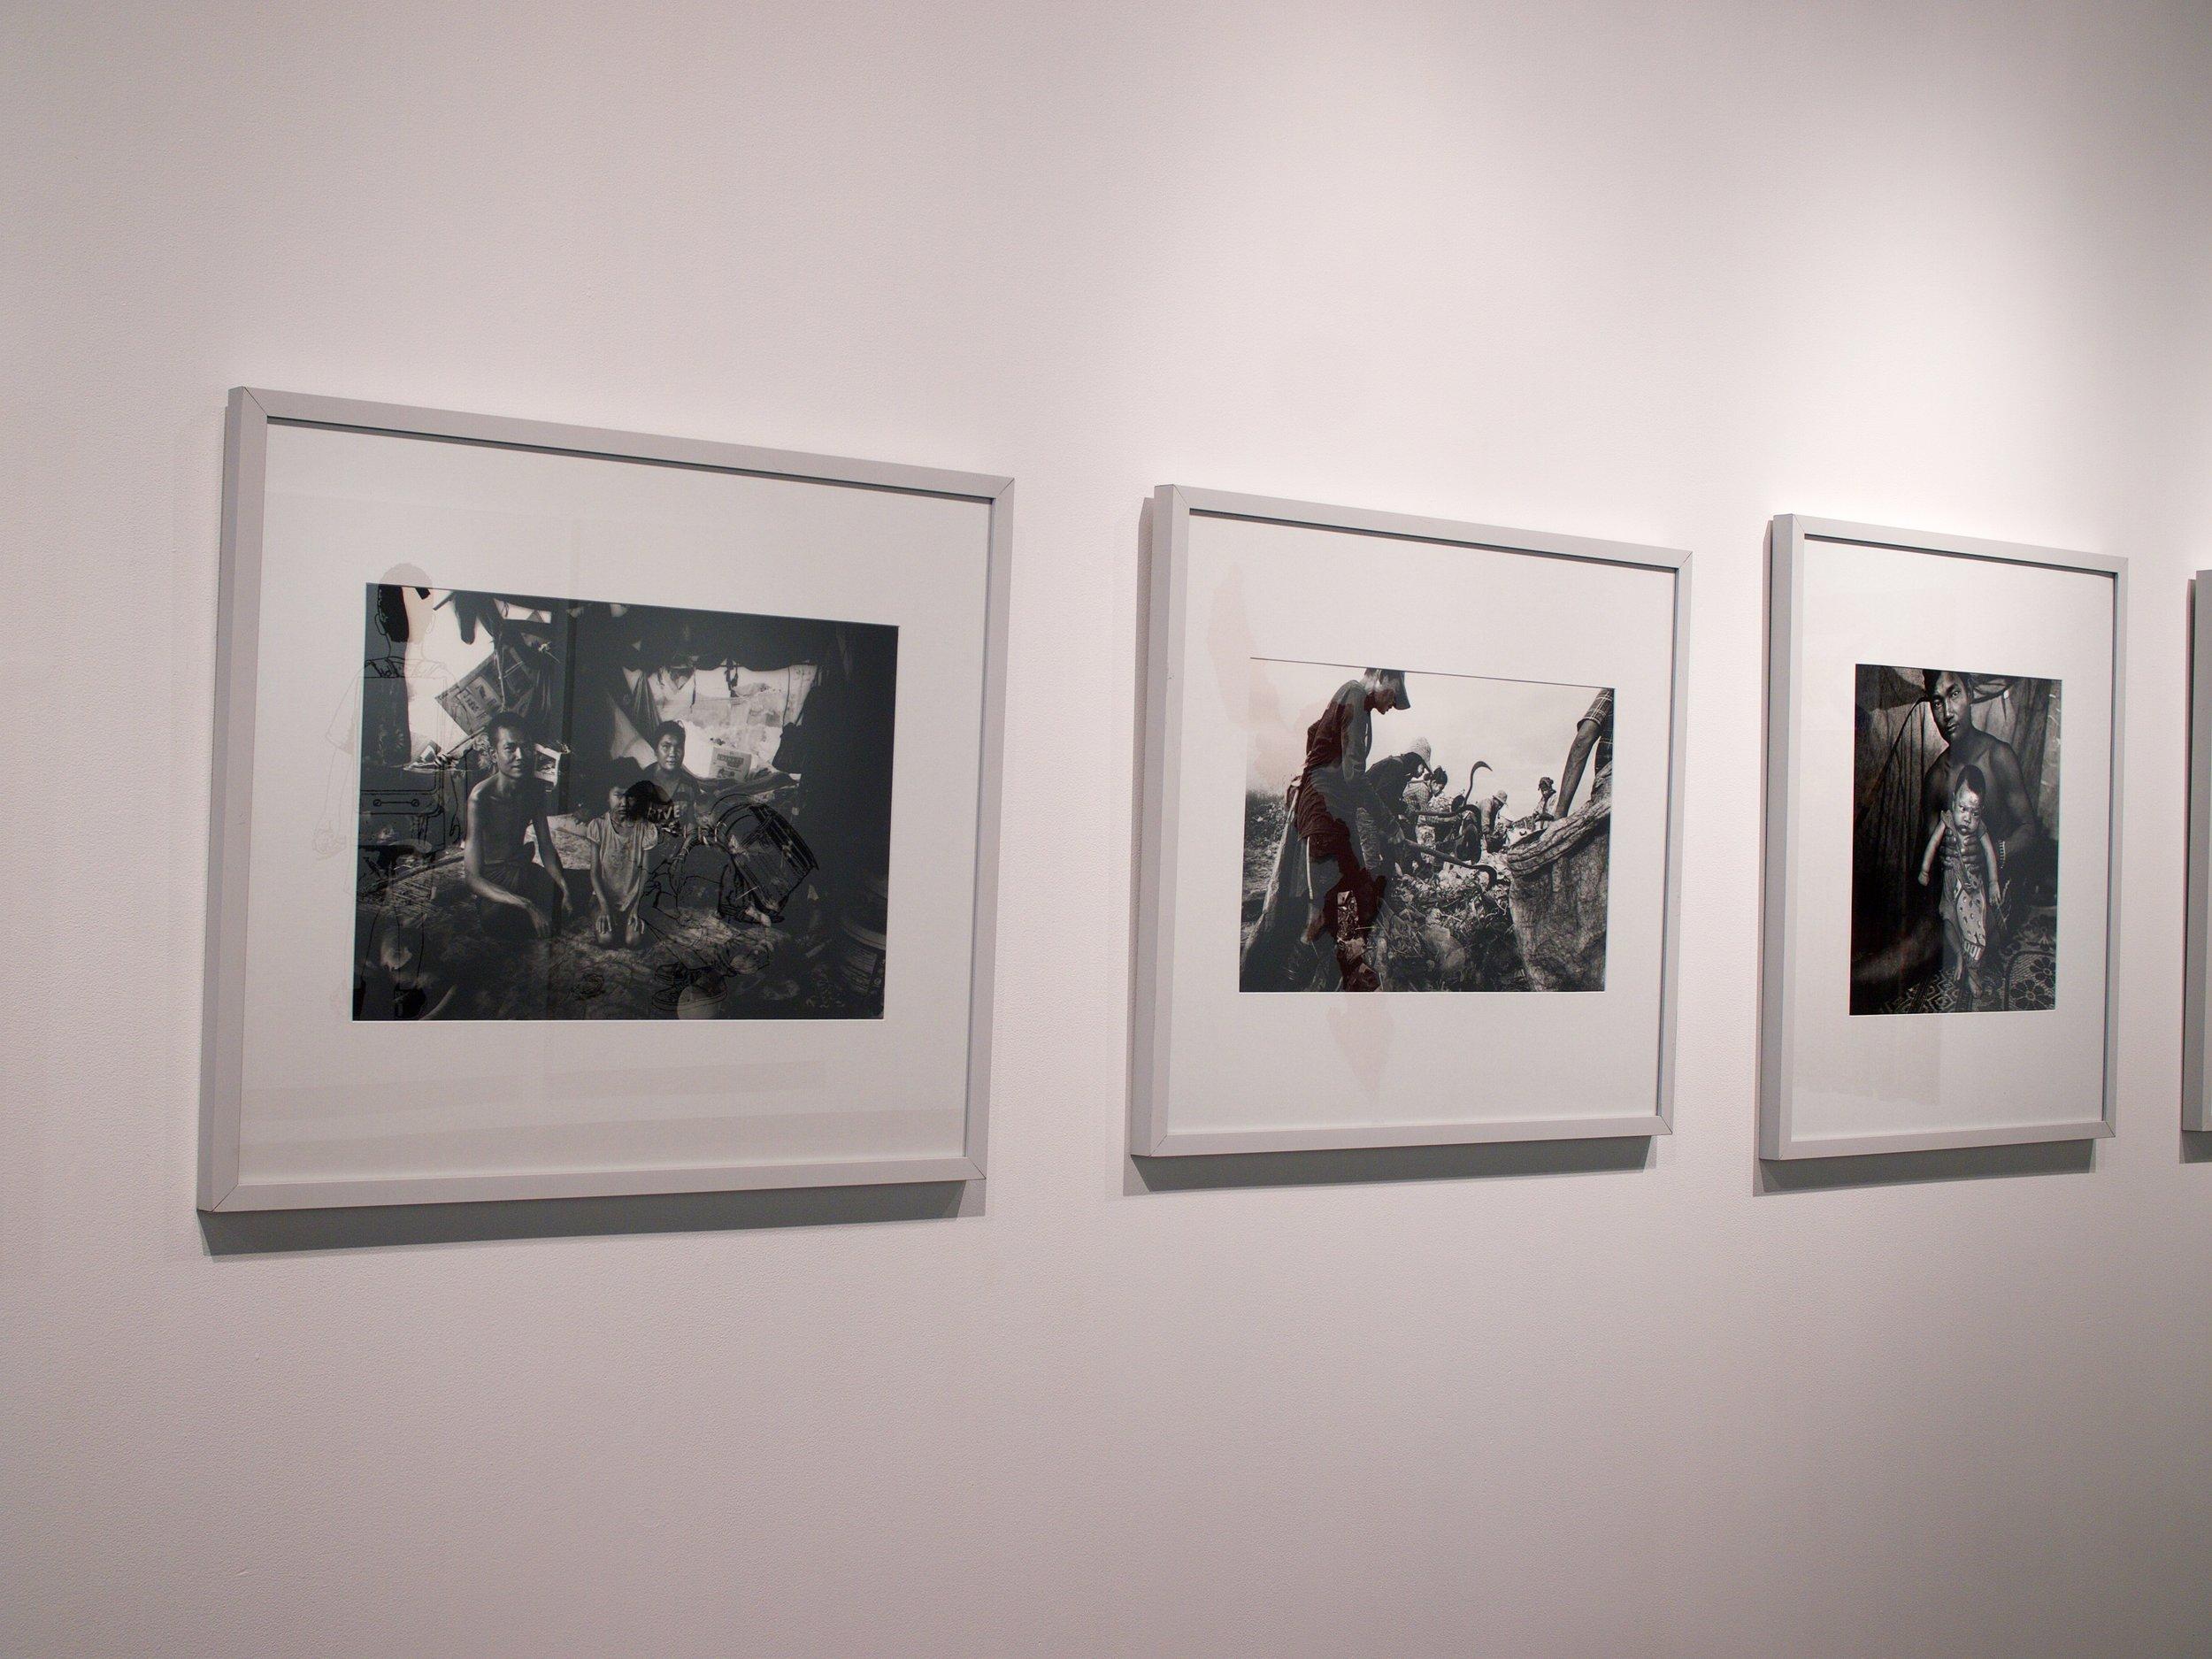 Gerry Yaum photography exhibit at Latitude 53